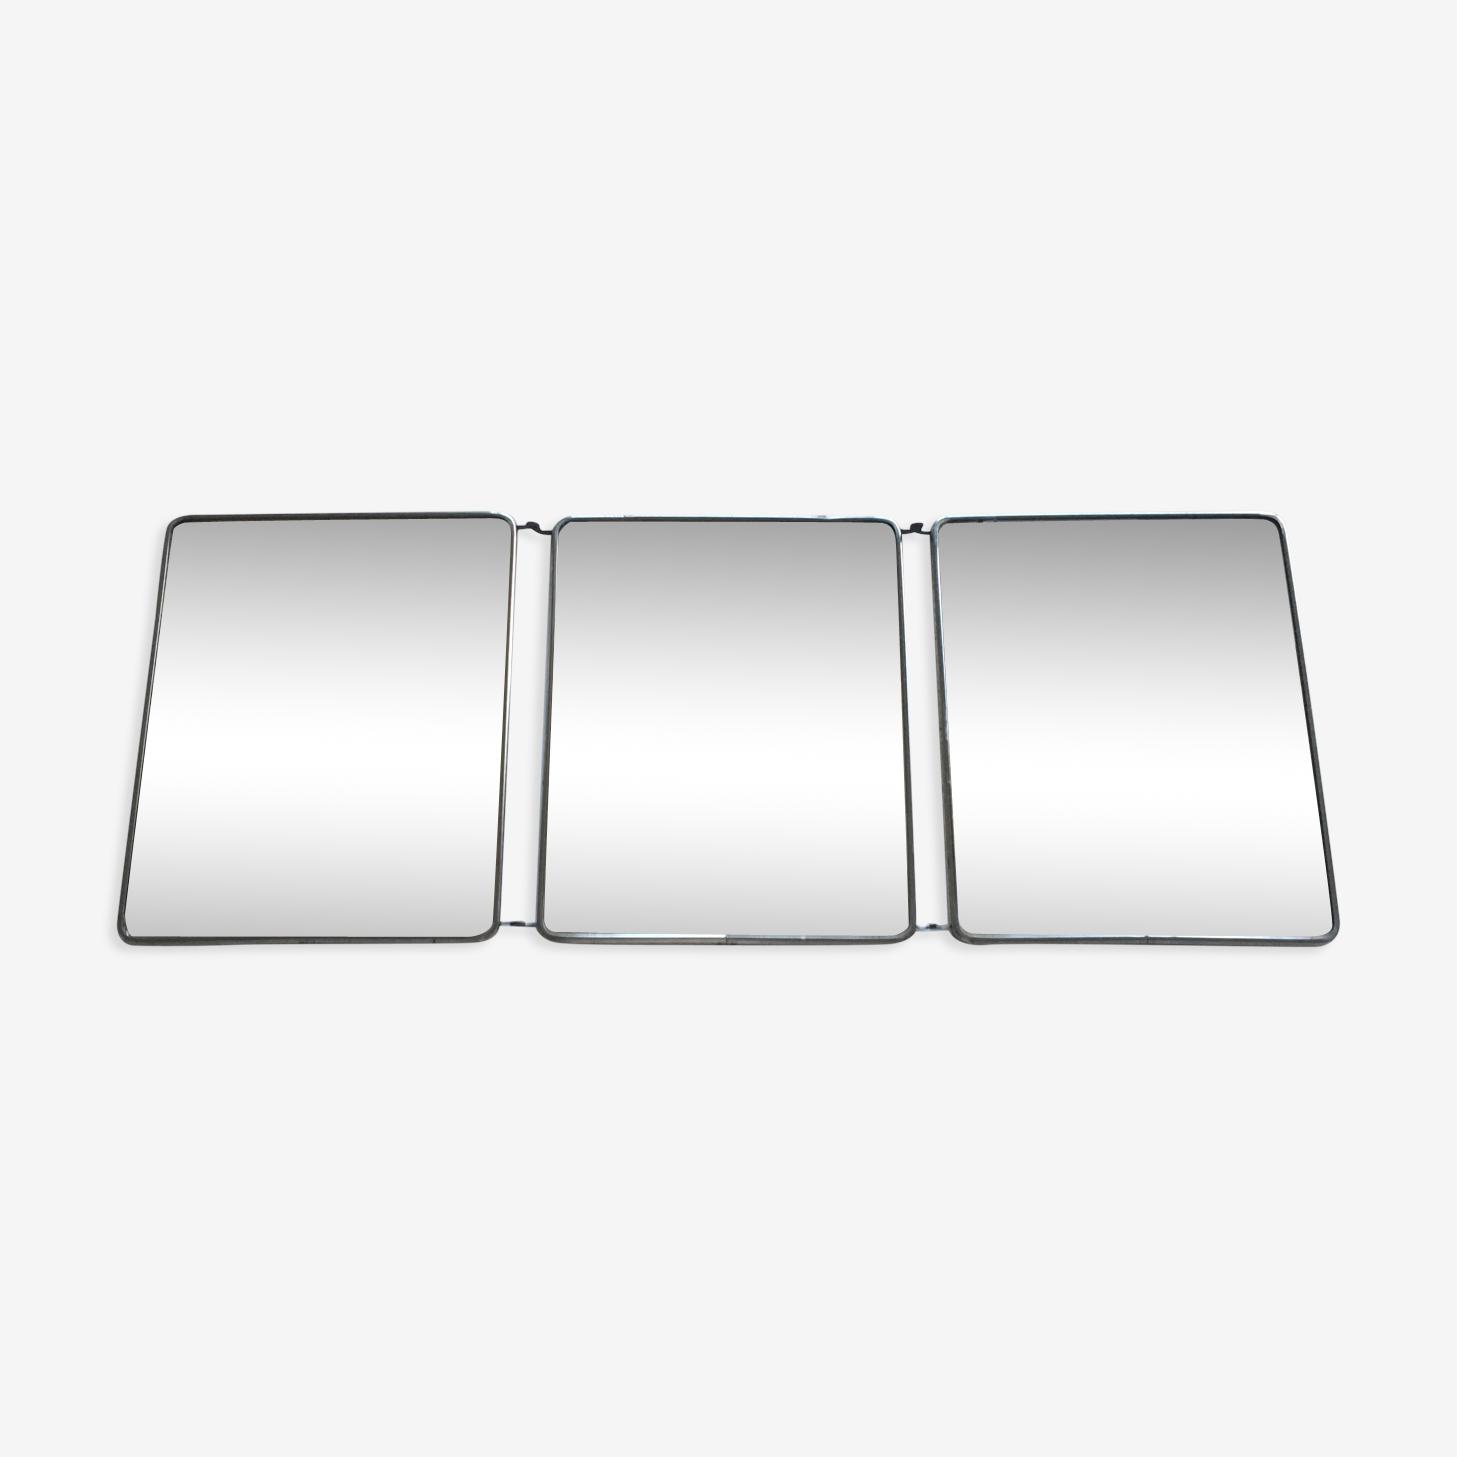 Mirror barber triptych 30x79cm